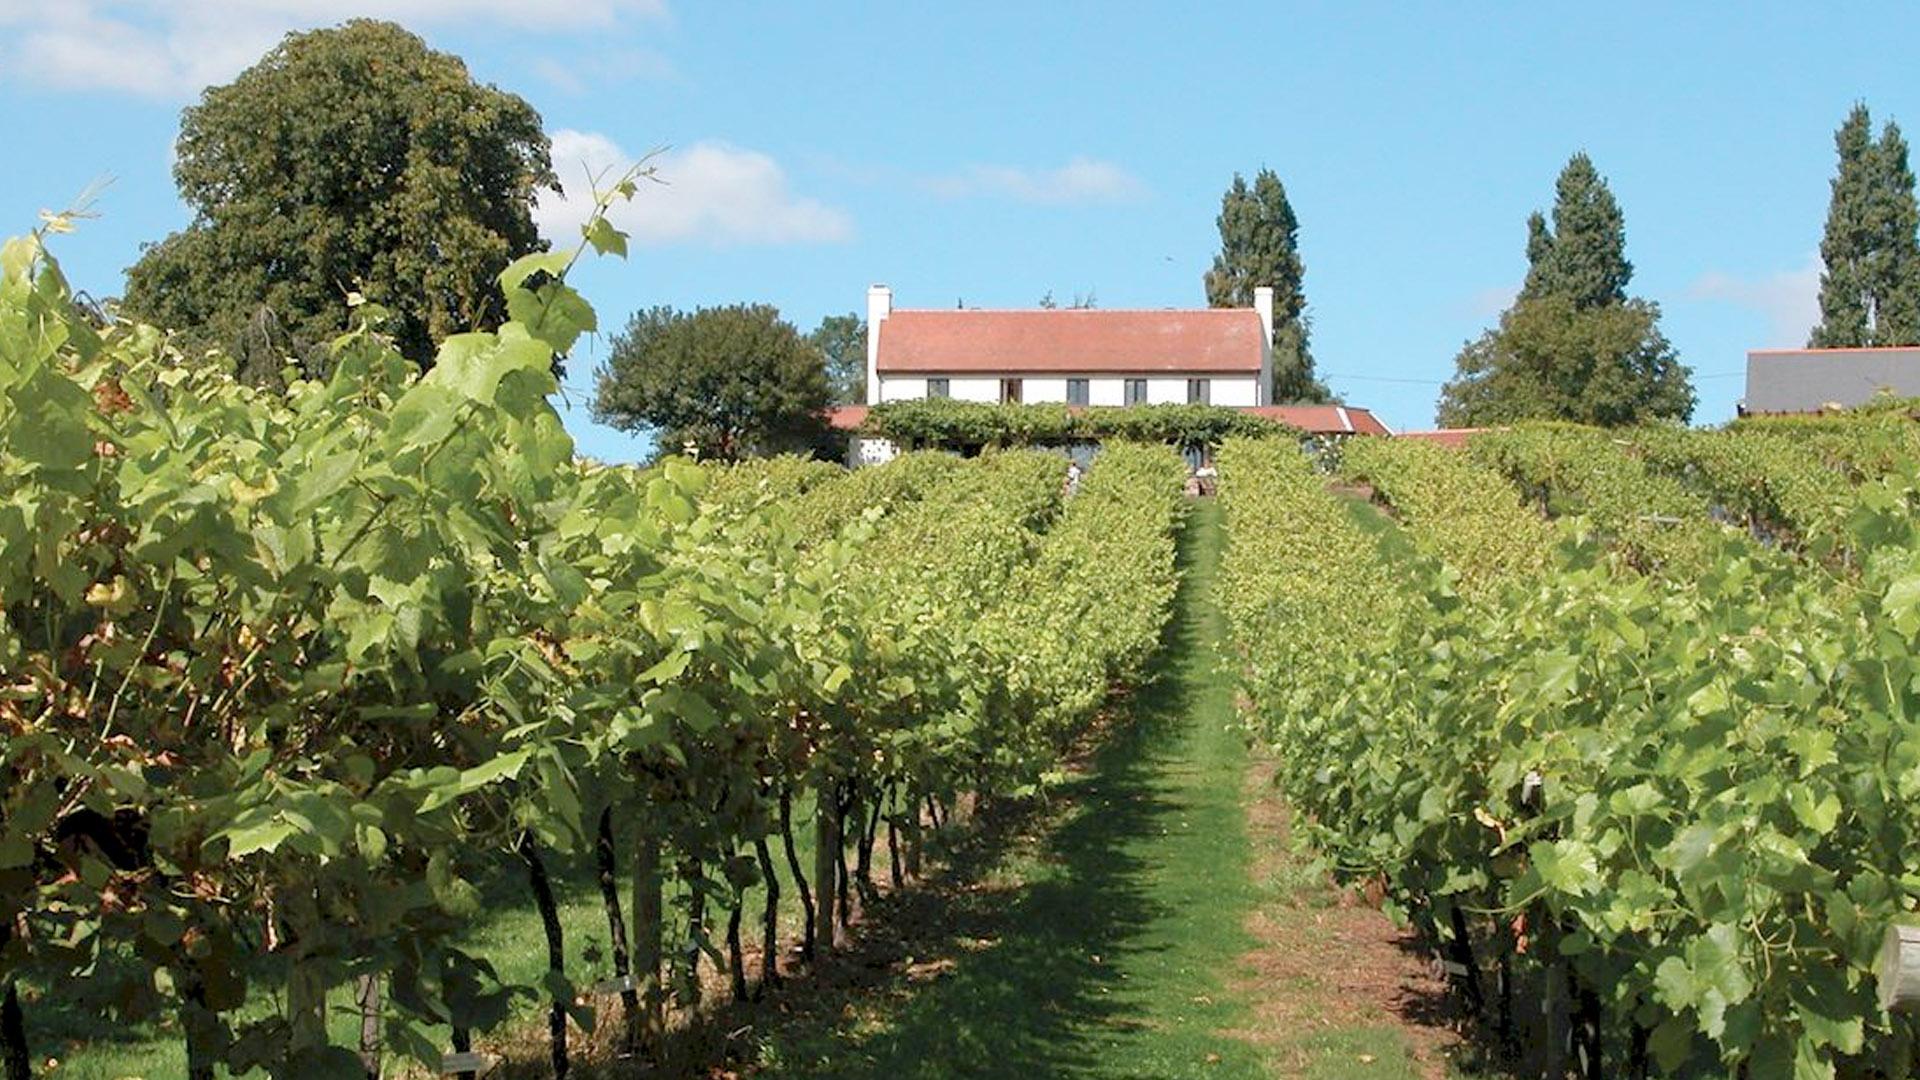 wine tasting vineyards the mercure southampton centre. Black Bedroom Furniture Sets. Home Design Ideas